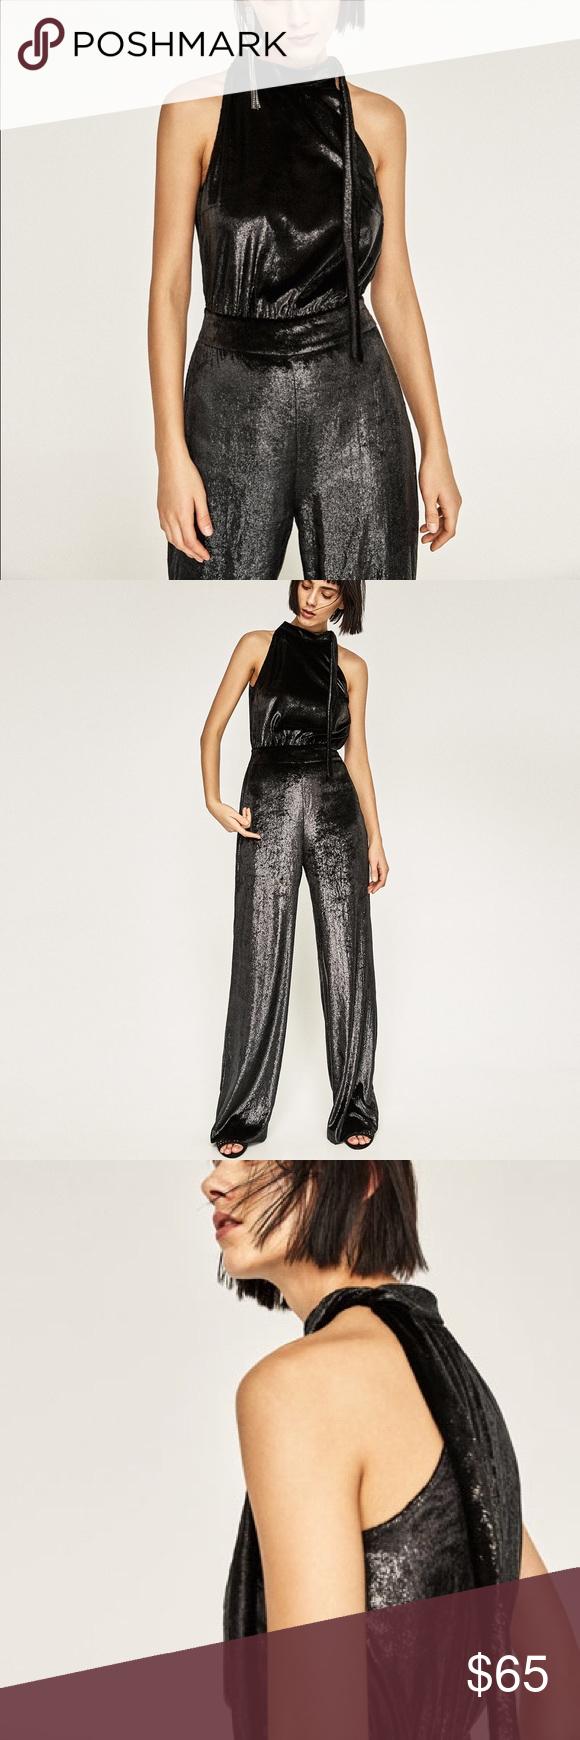 1204b20ebf Zara Velvet Shiny Jumpsuit Beautiful